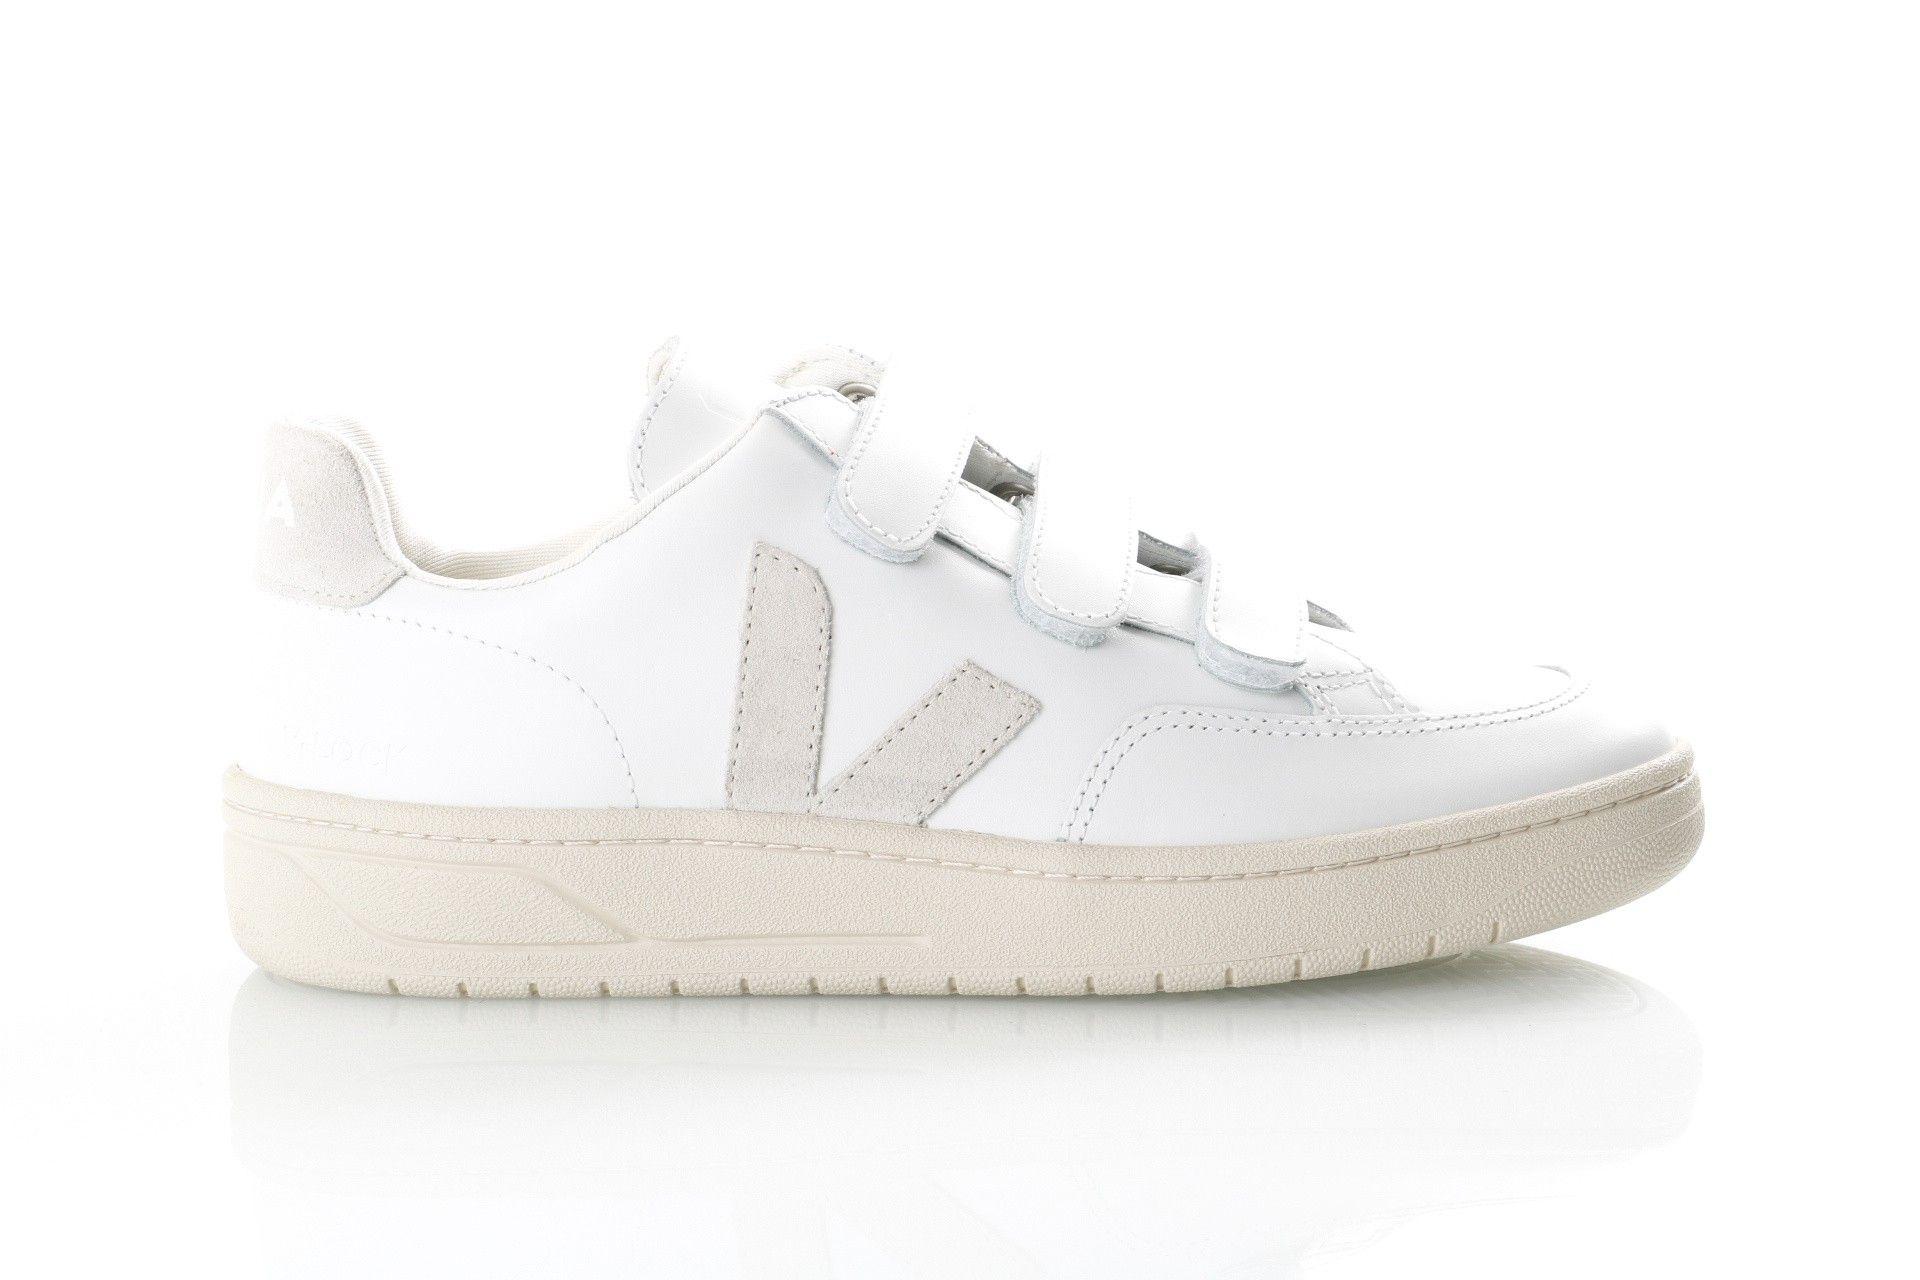 Afbeelding van Veja V-12_Velcro Xc021535 Sneakers Extra White/ Natural